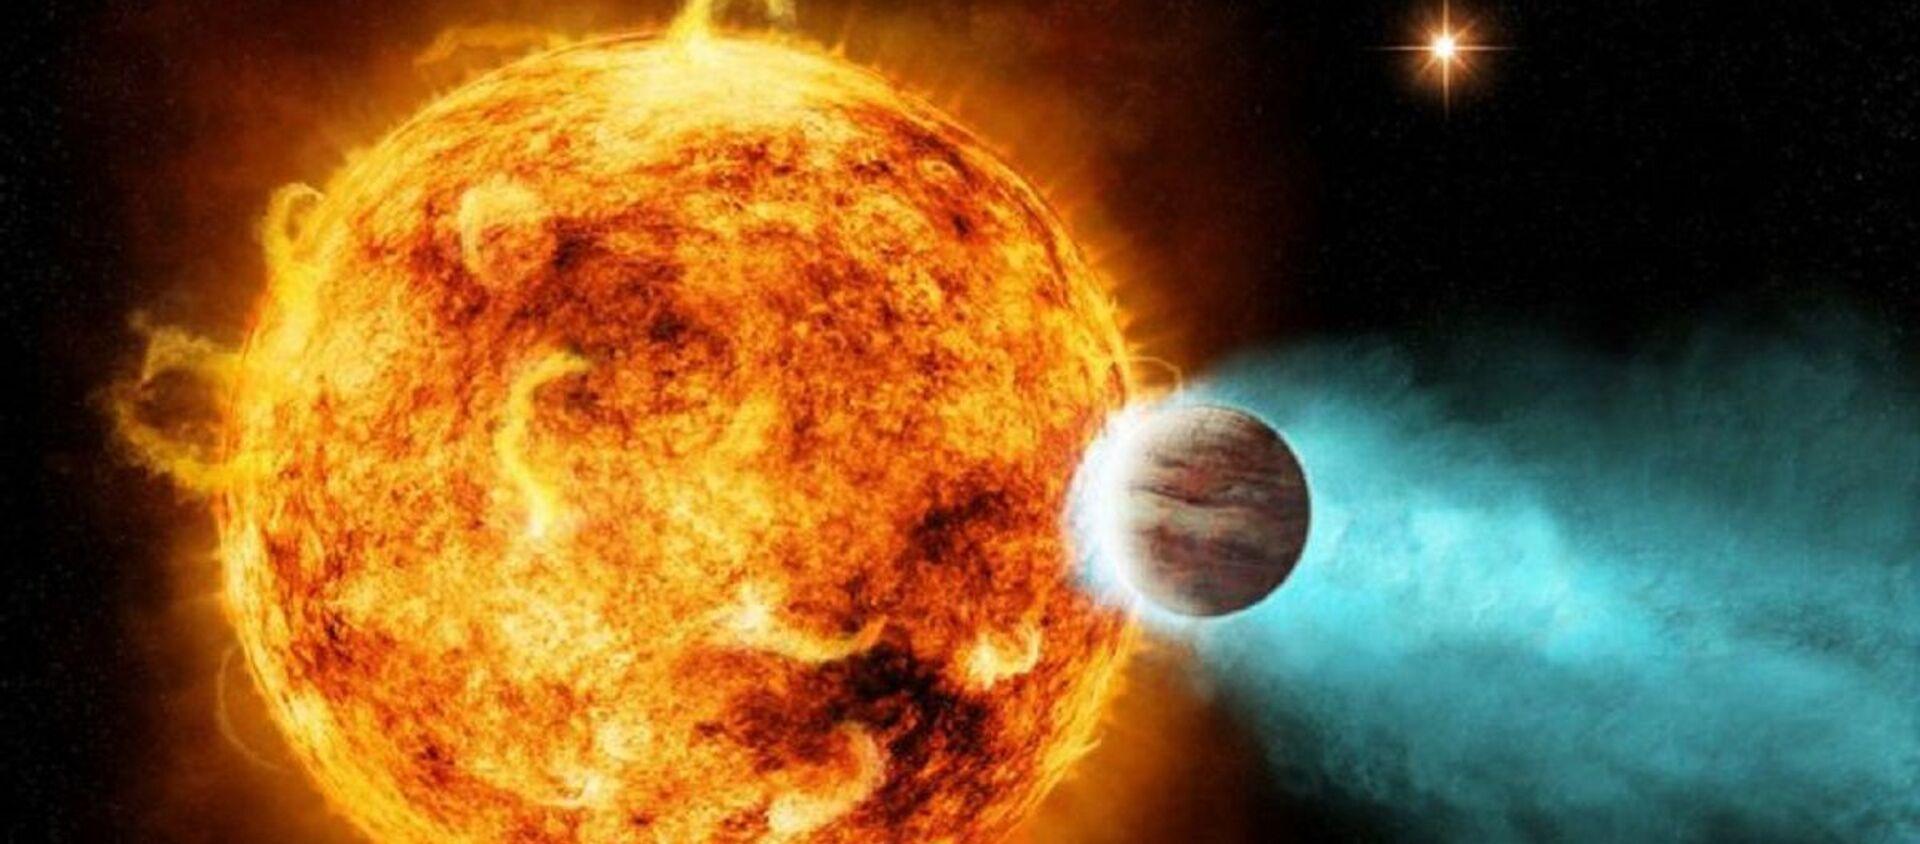 Planeta y sol - Sputnik Mundo, 1920, 03.11.2020